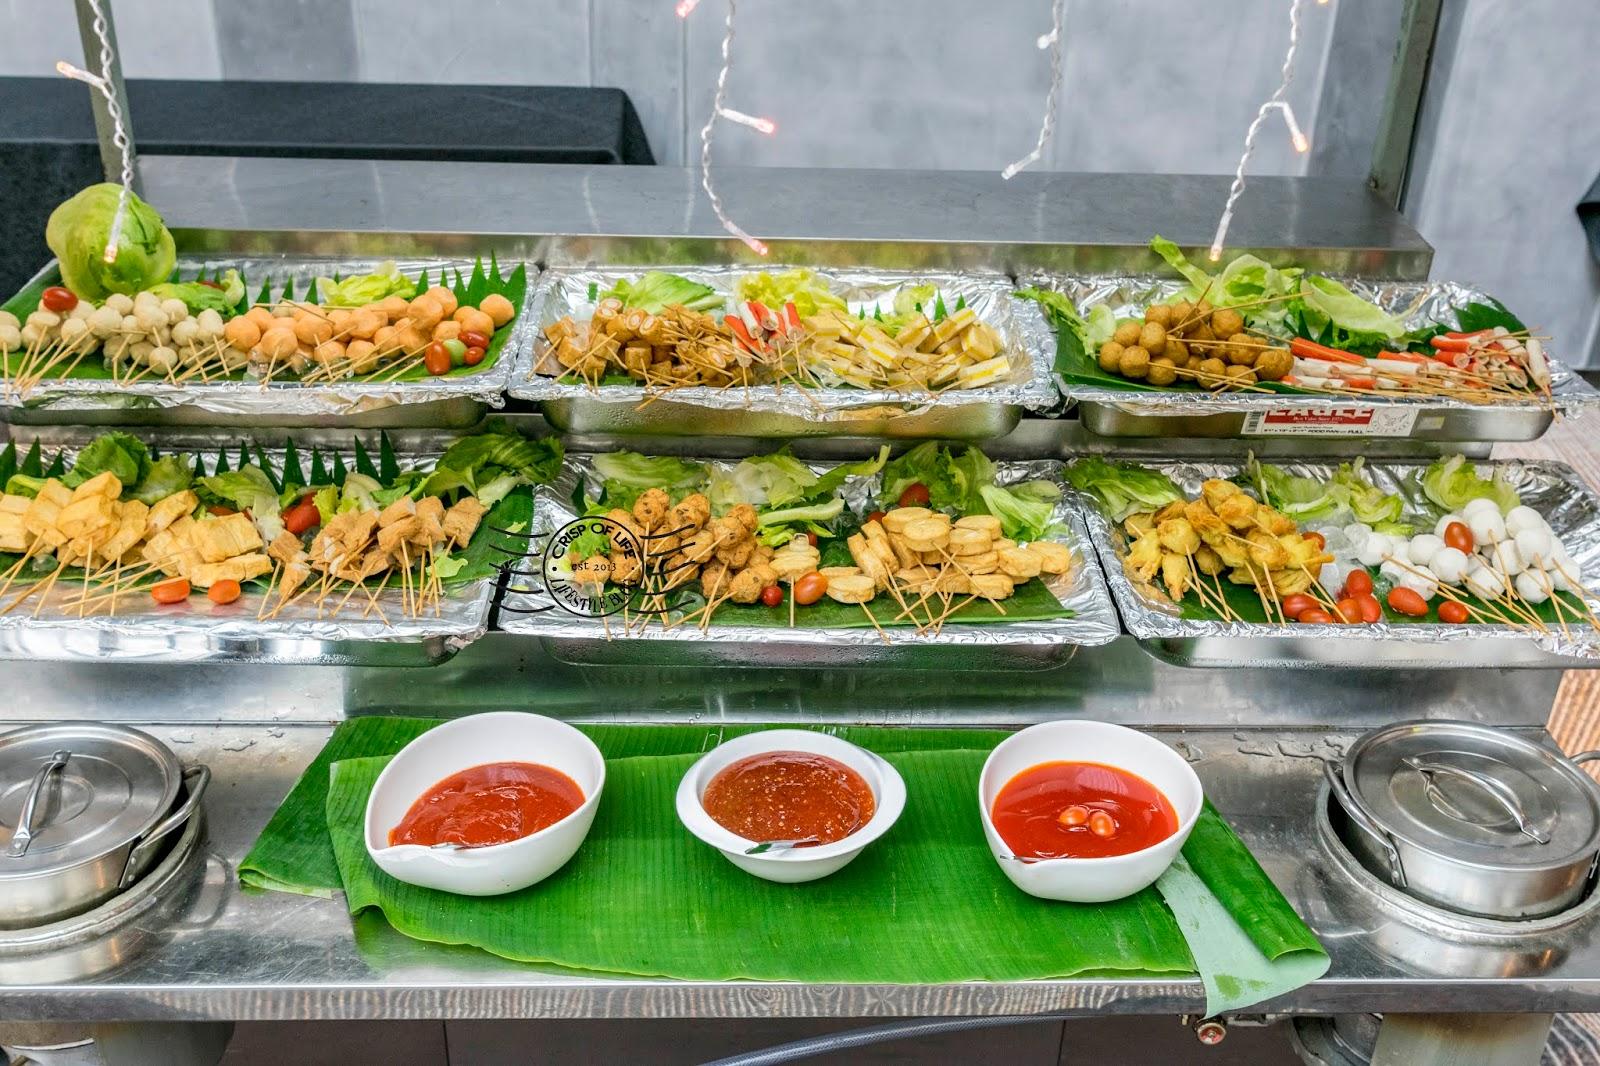 Durian Theme Iftar Ramadhan Setia SPICE, Penang